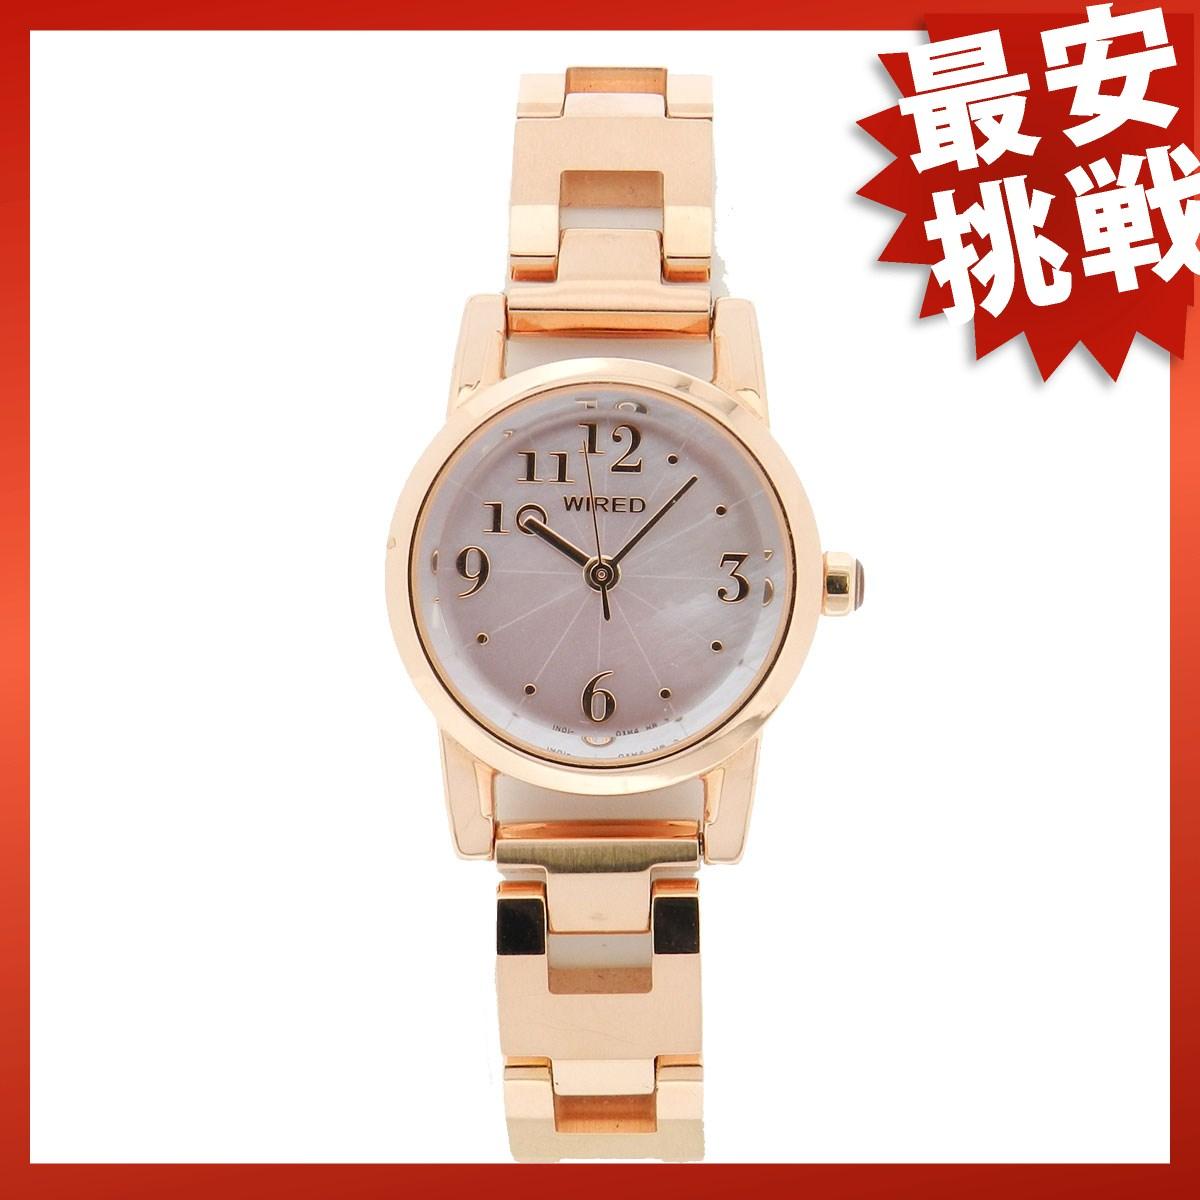 Kyonokura Komaki Brand Cheapest Challenger | Rakuten Global Market ...